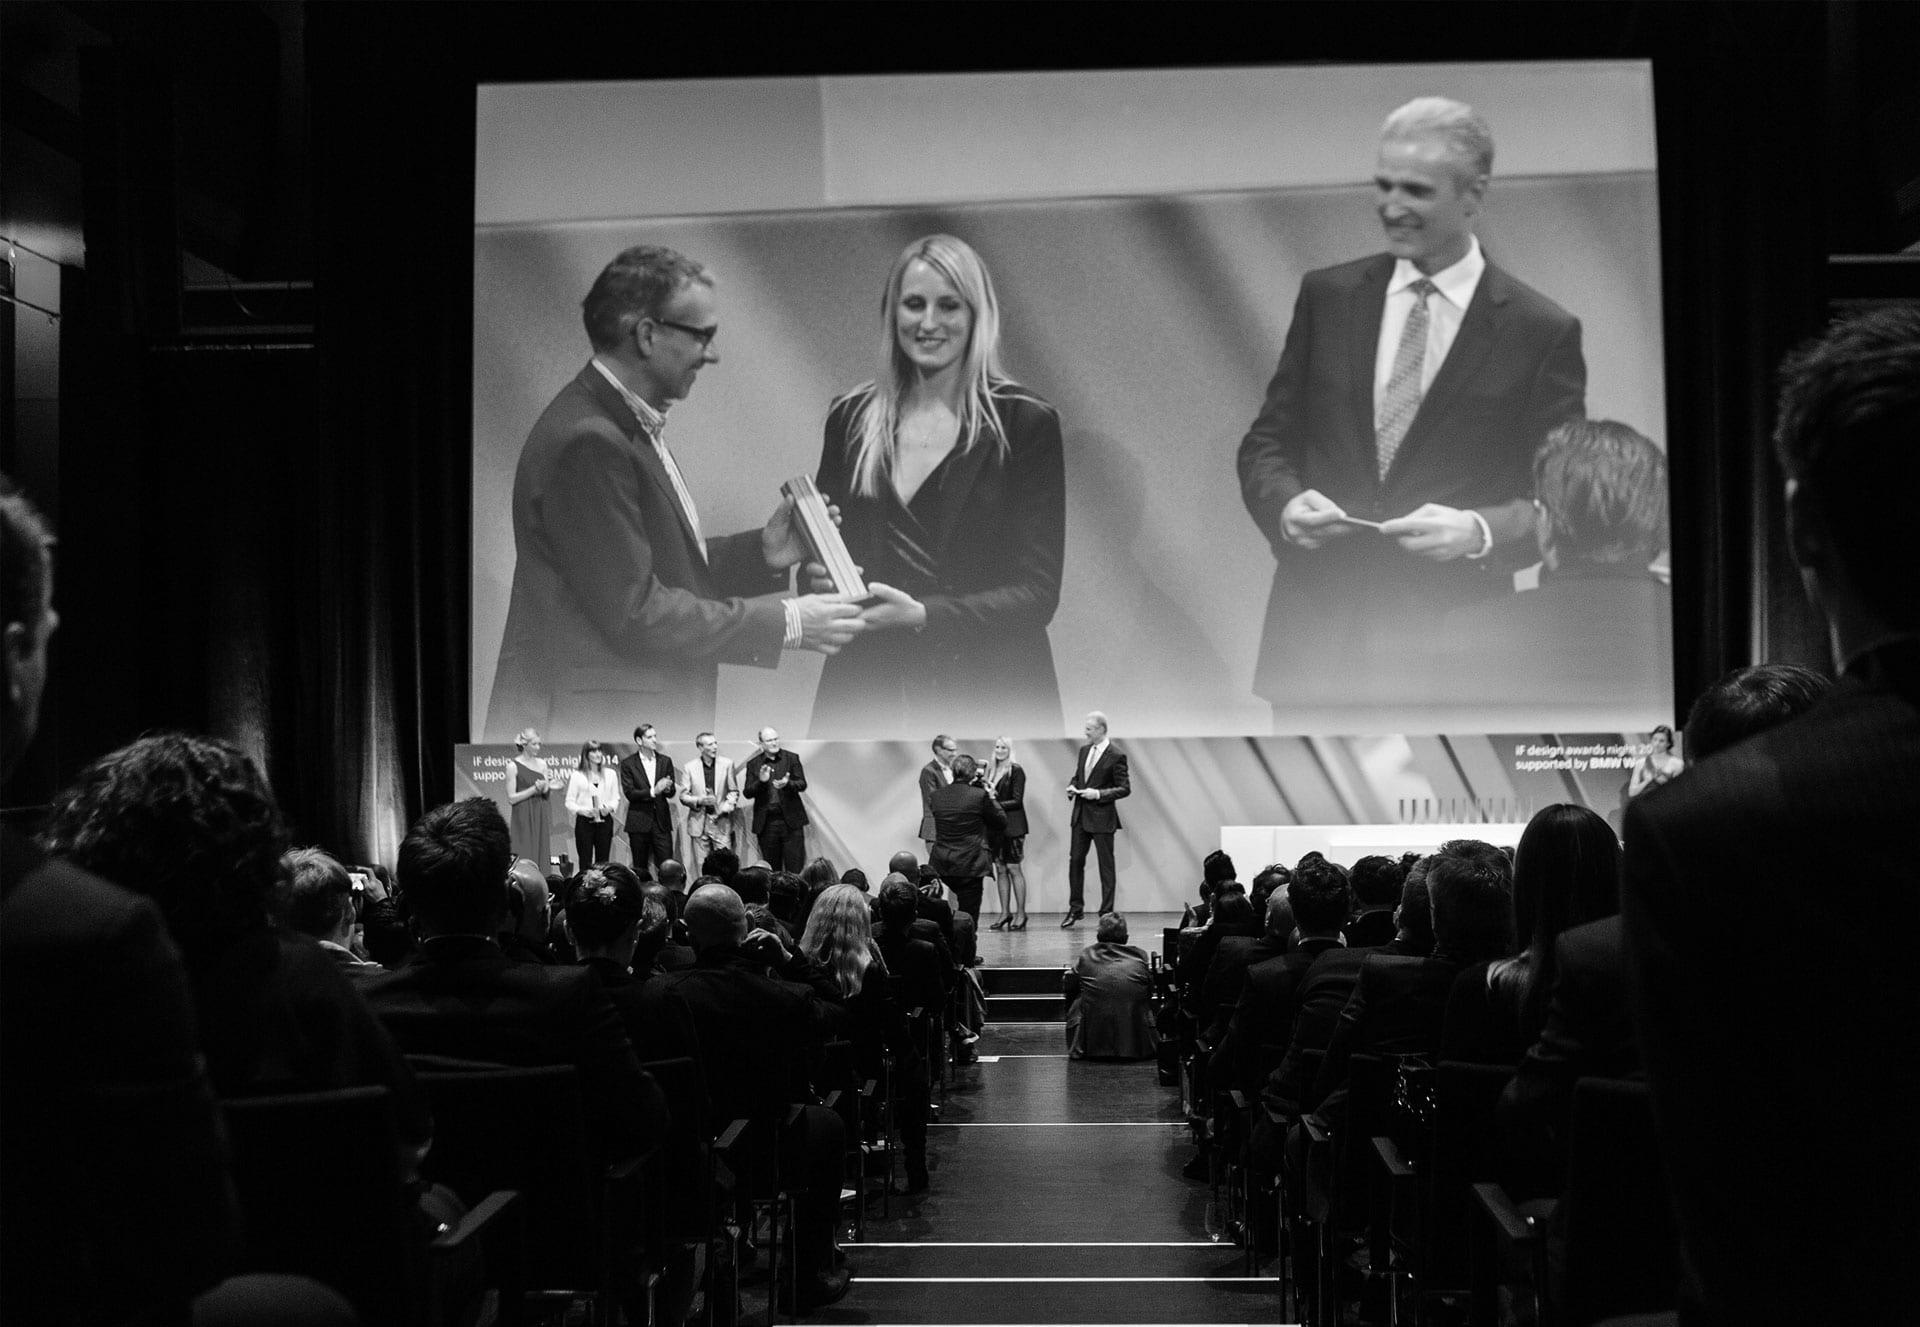 World Design Capital Valencia 2022 and iF Design announce partnership